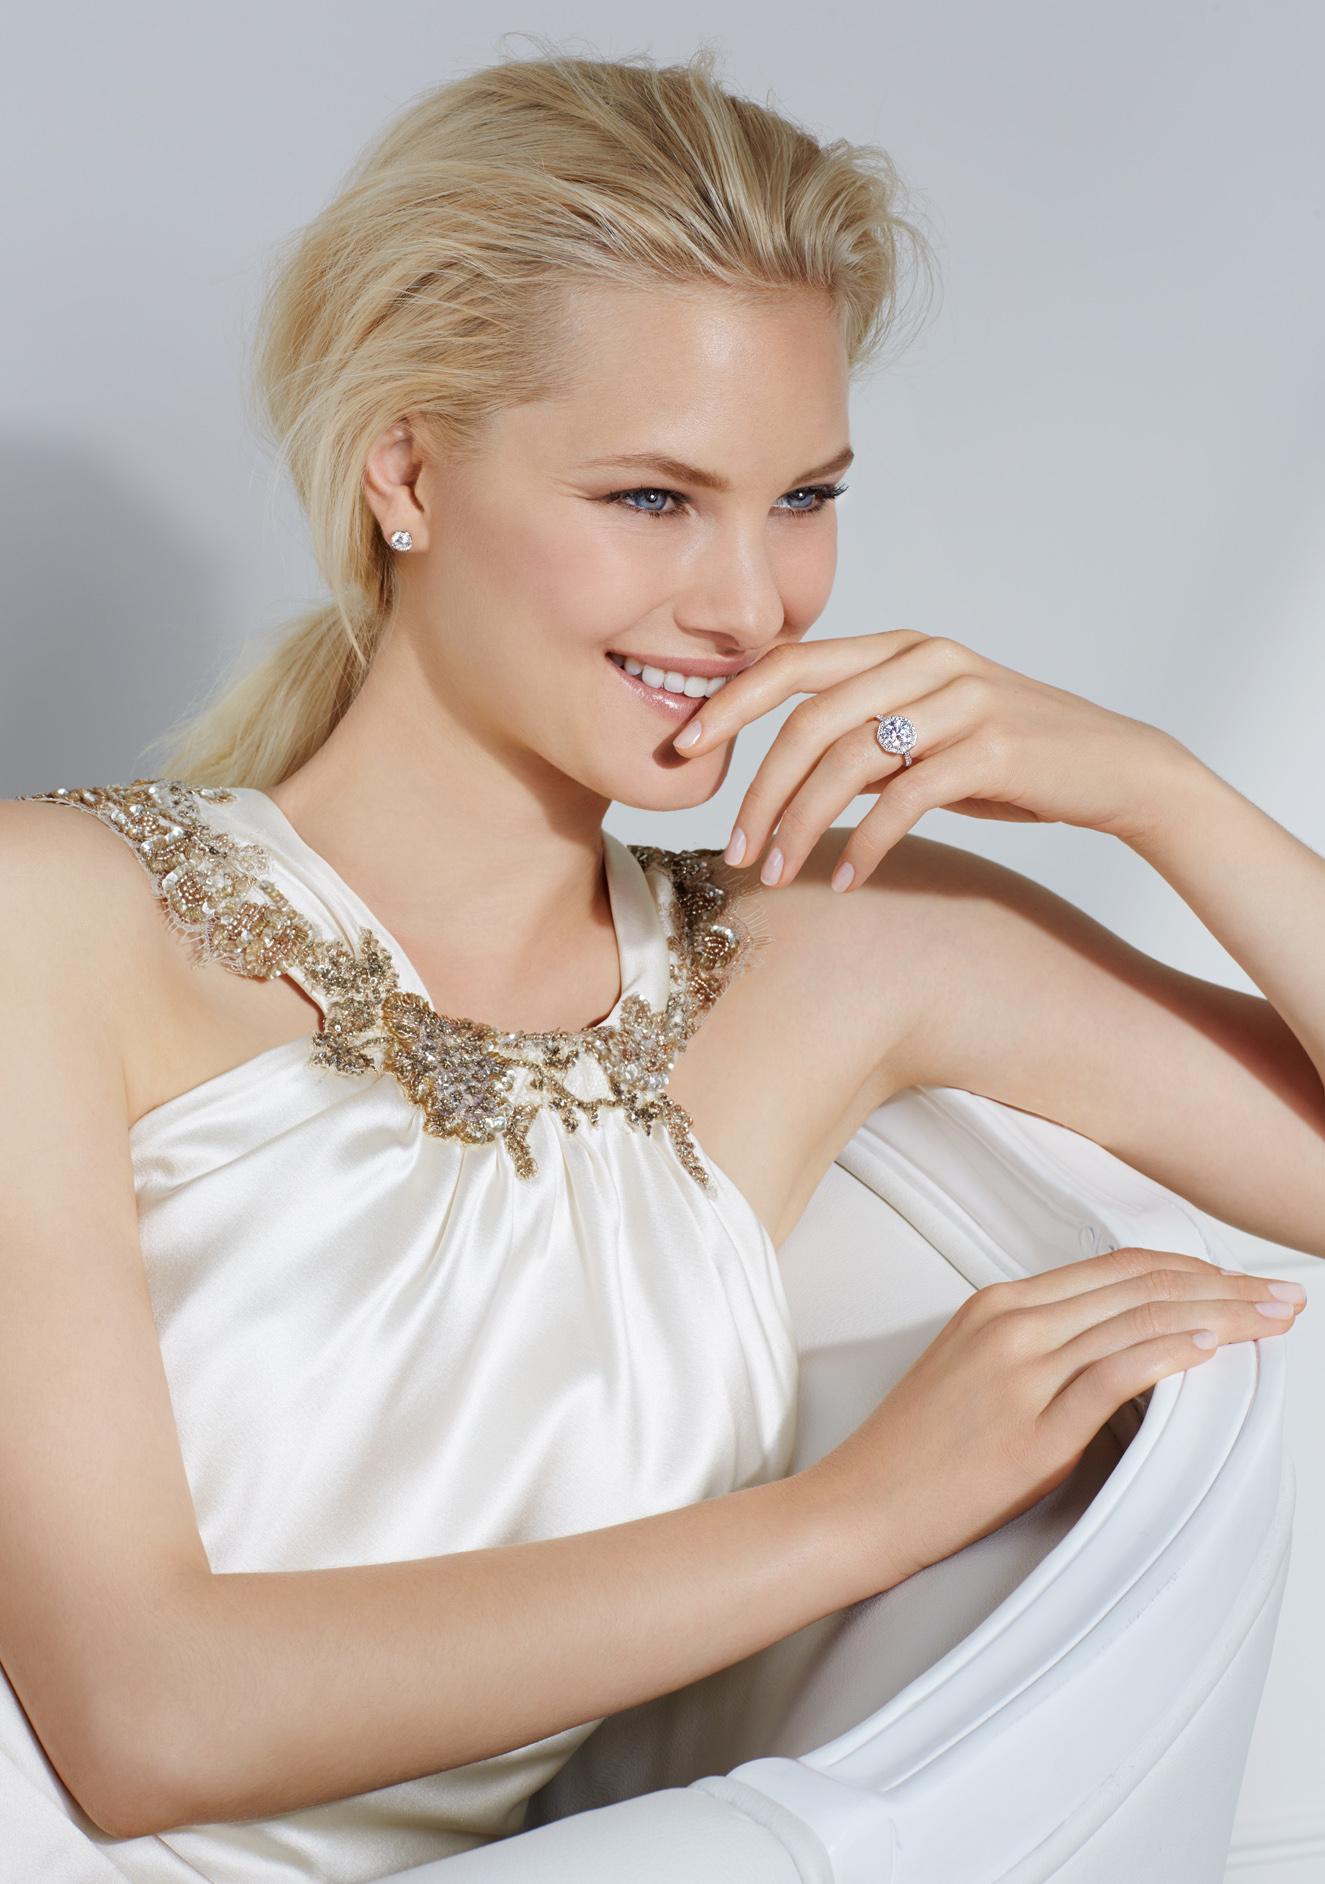 OscarWinter_jewellery 6crop.jpg